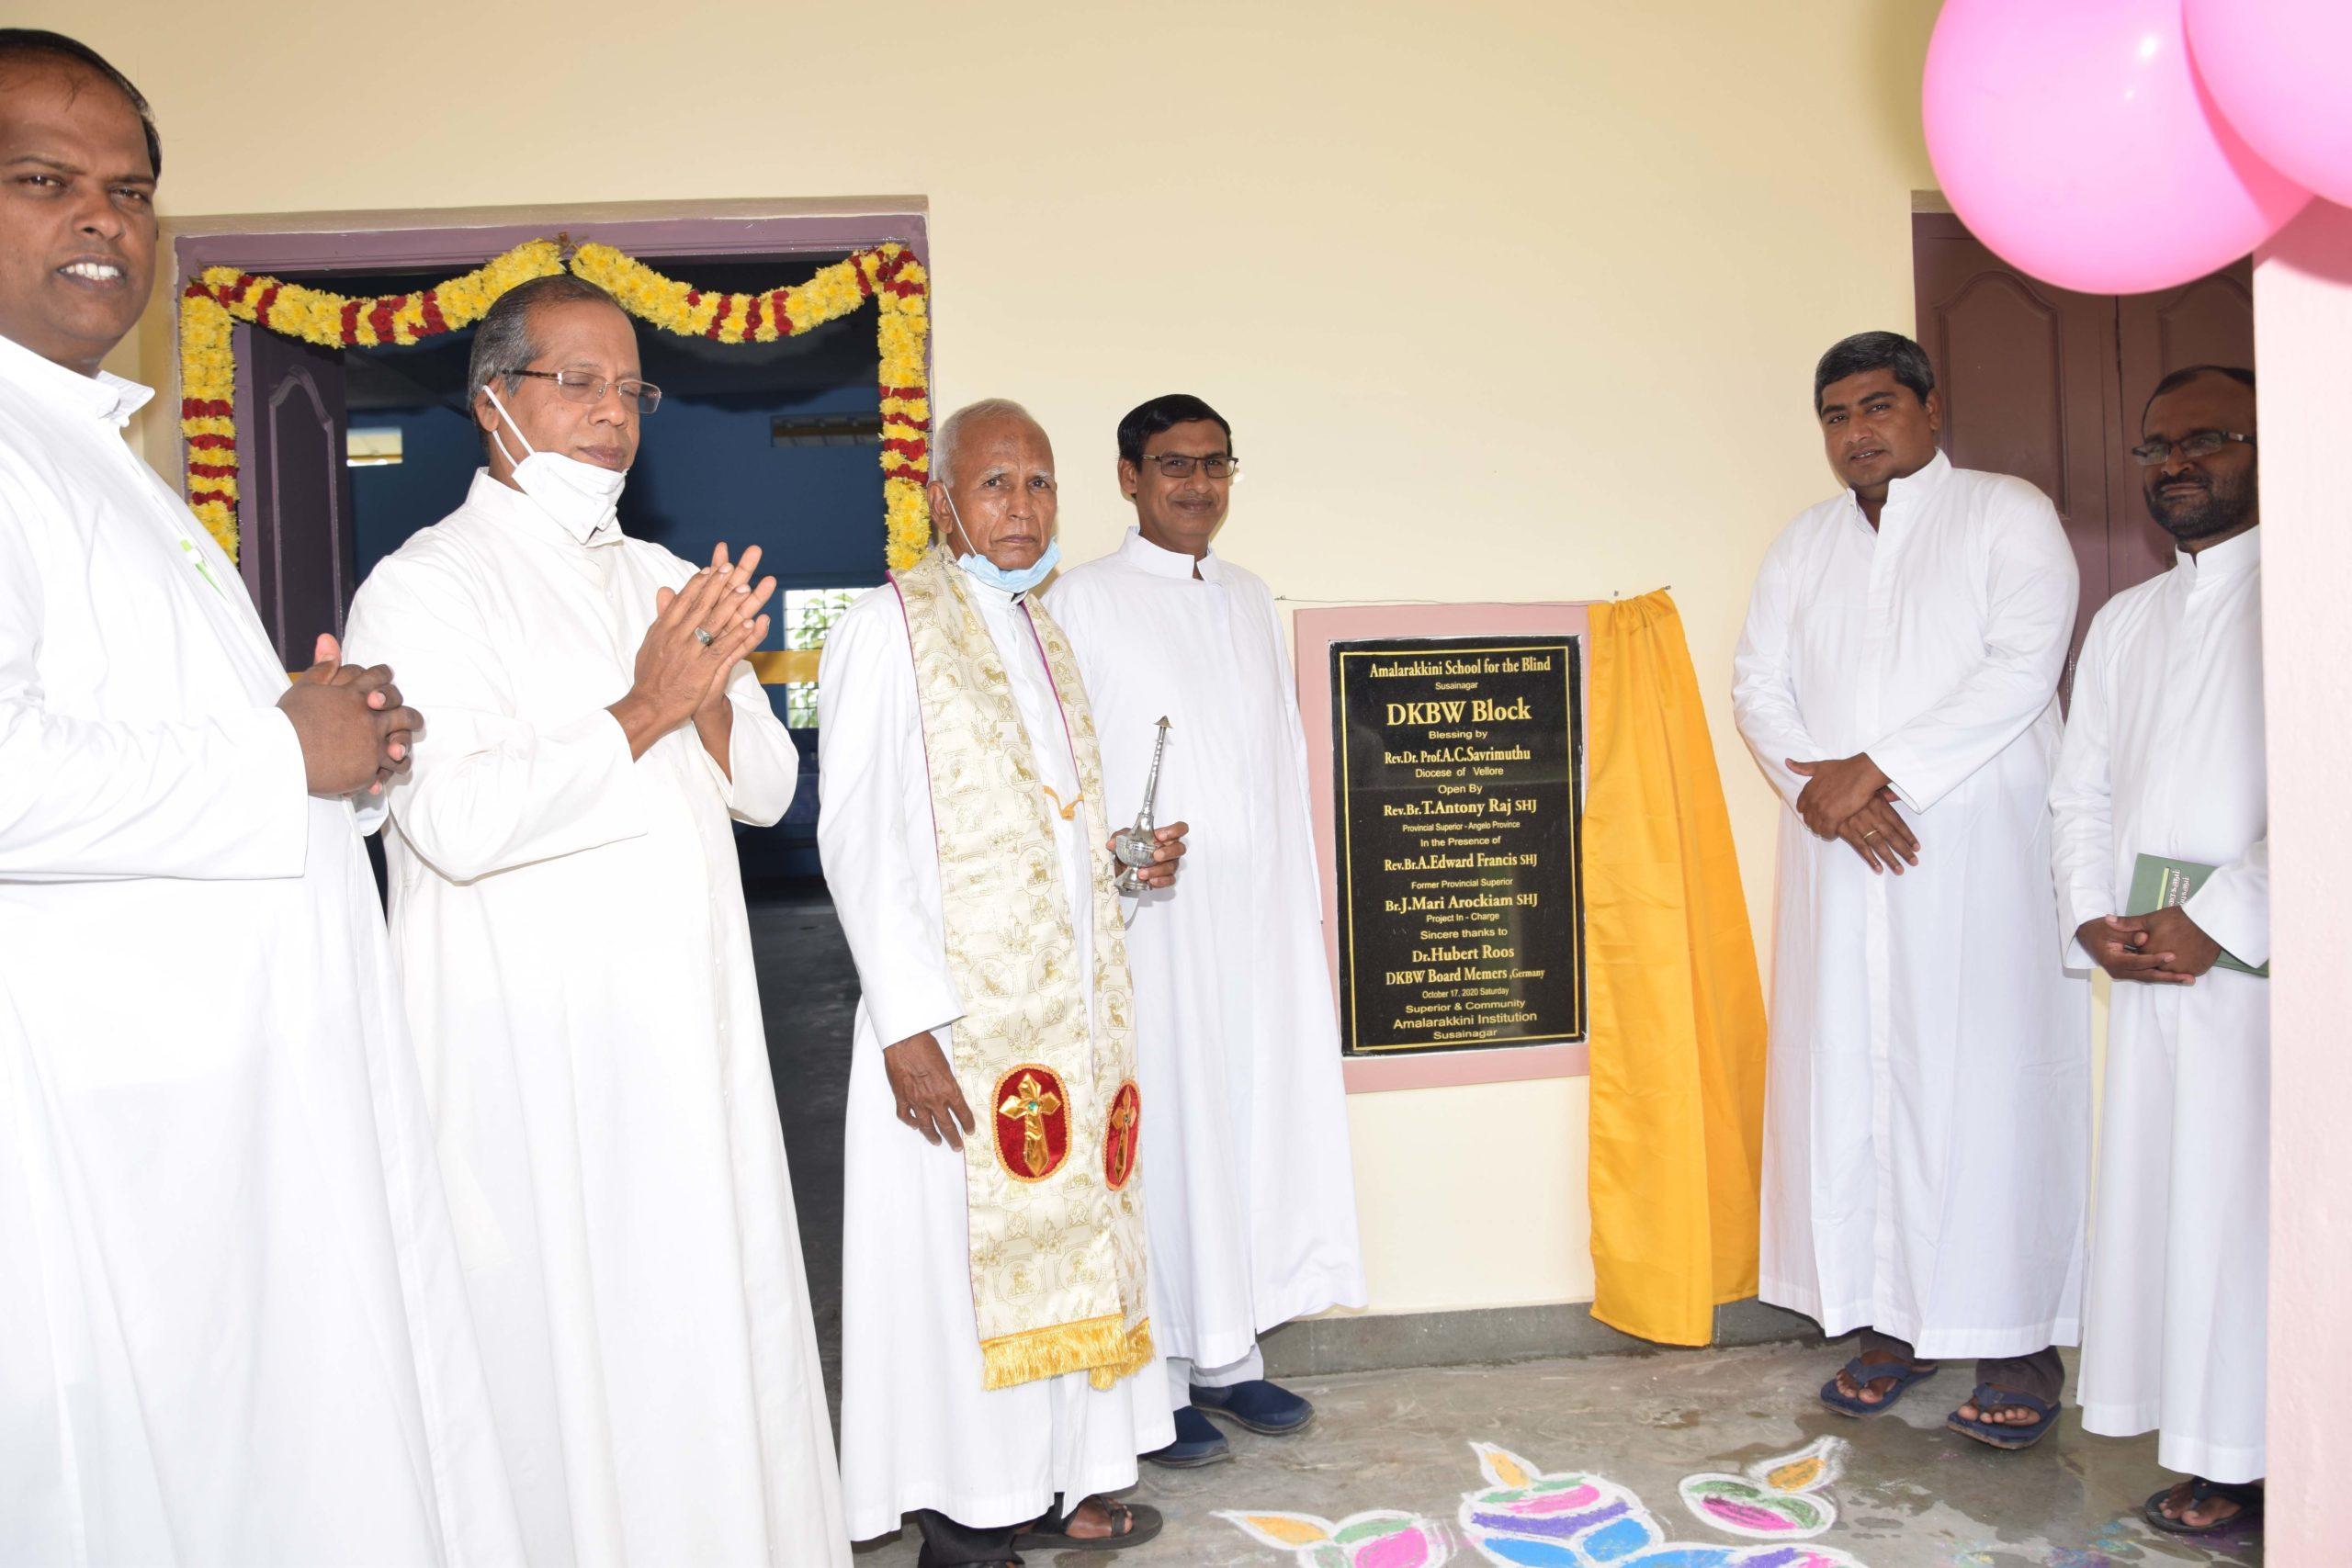 Susainagar – Amalarakkini School for the Blind